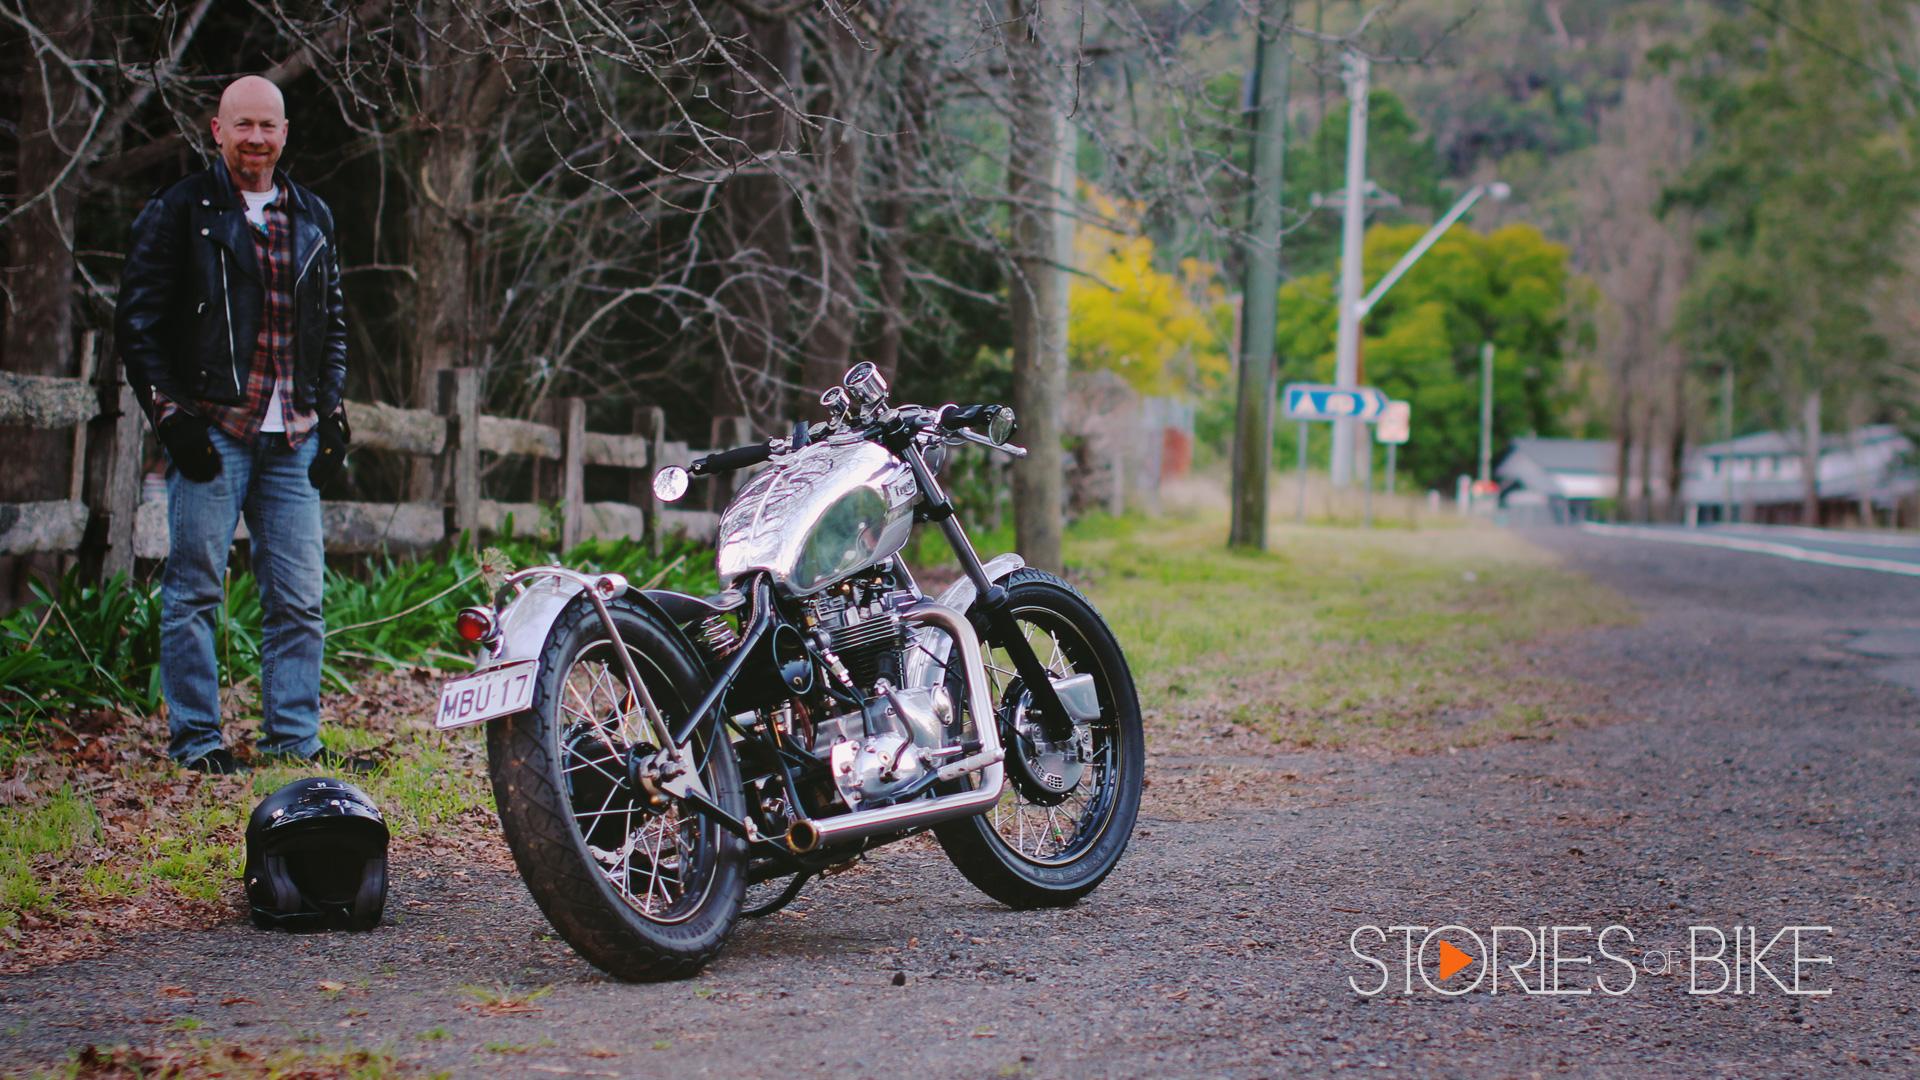 Stories_of_Bike_Publicity_Ep7_3.jpg